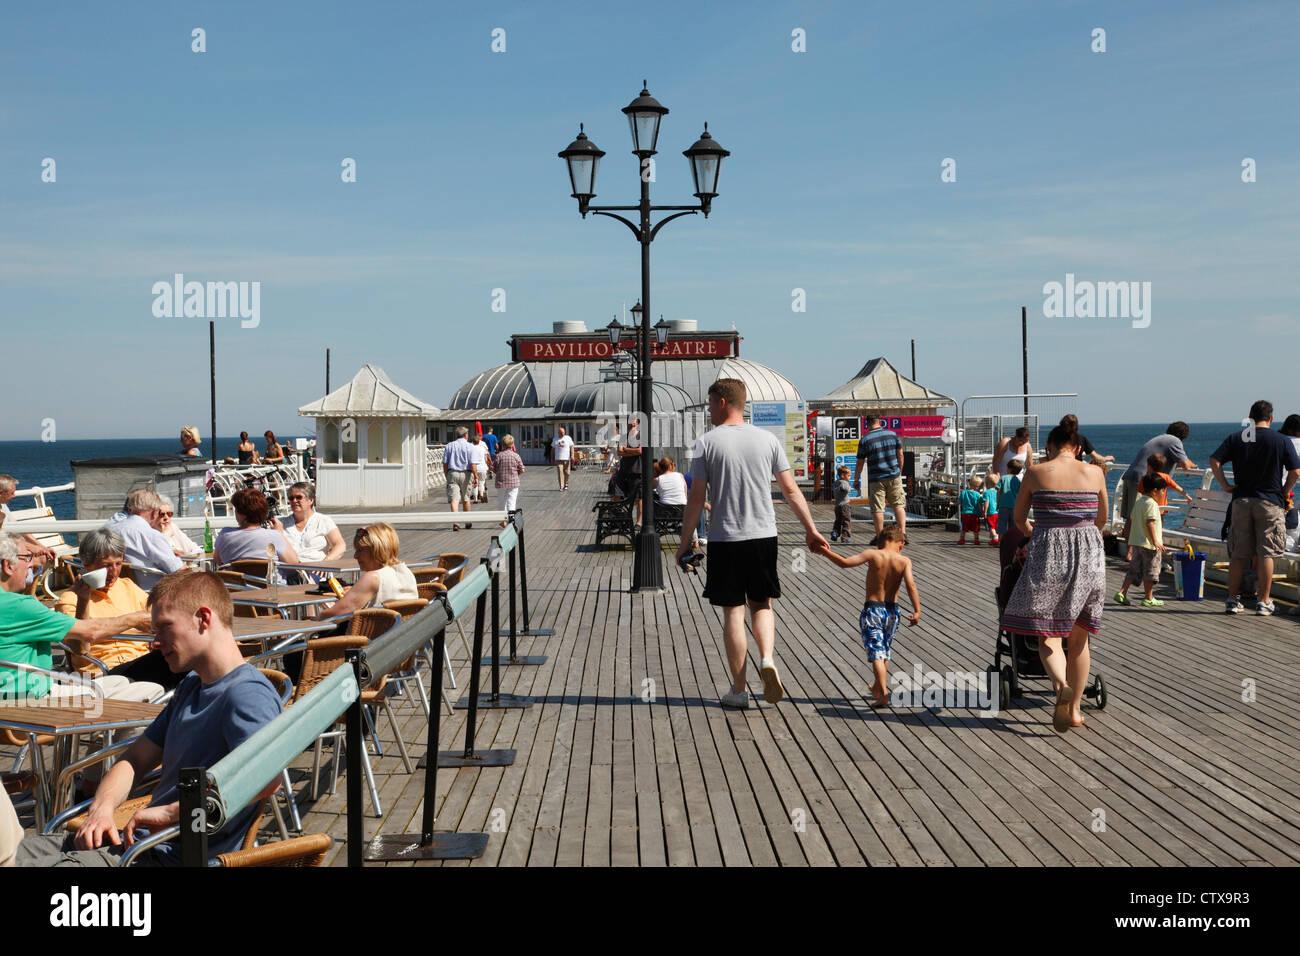 Cromer Pier, Norfolk, England, U.K. - Stock Image